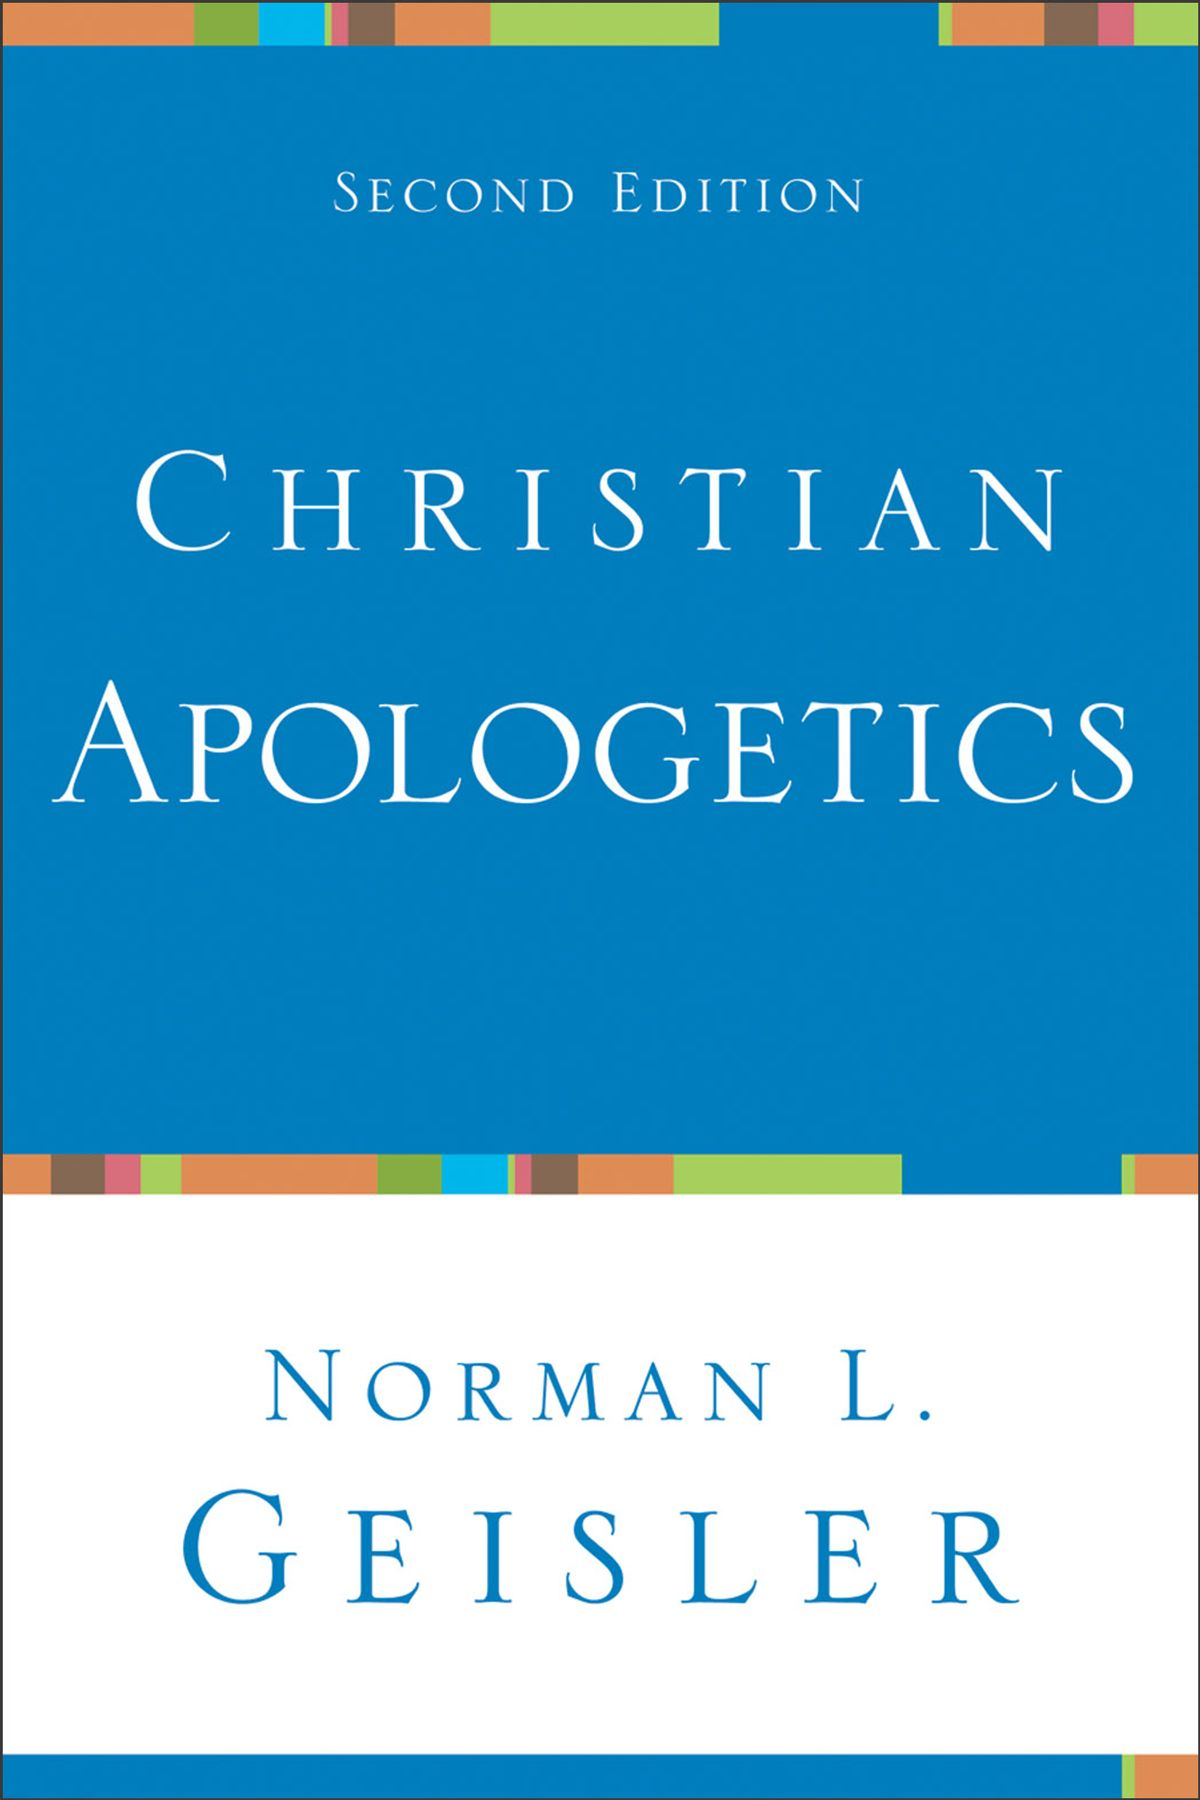 christian-apologetics-2.jpg